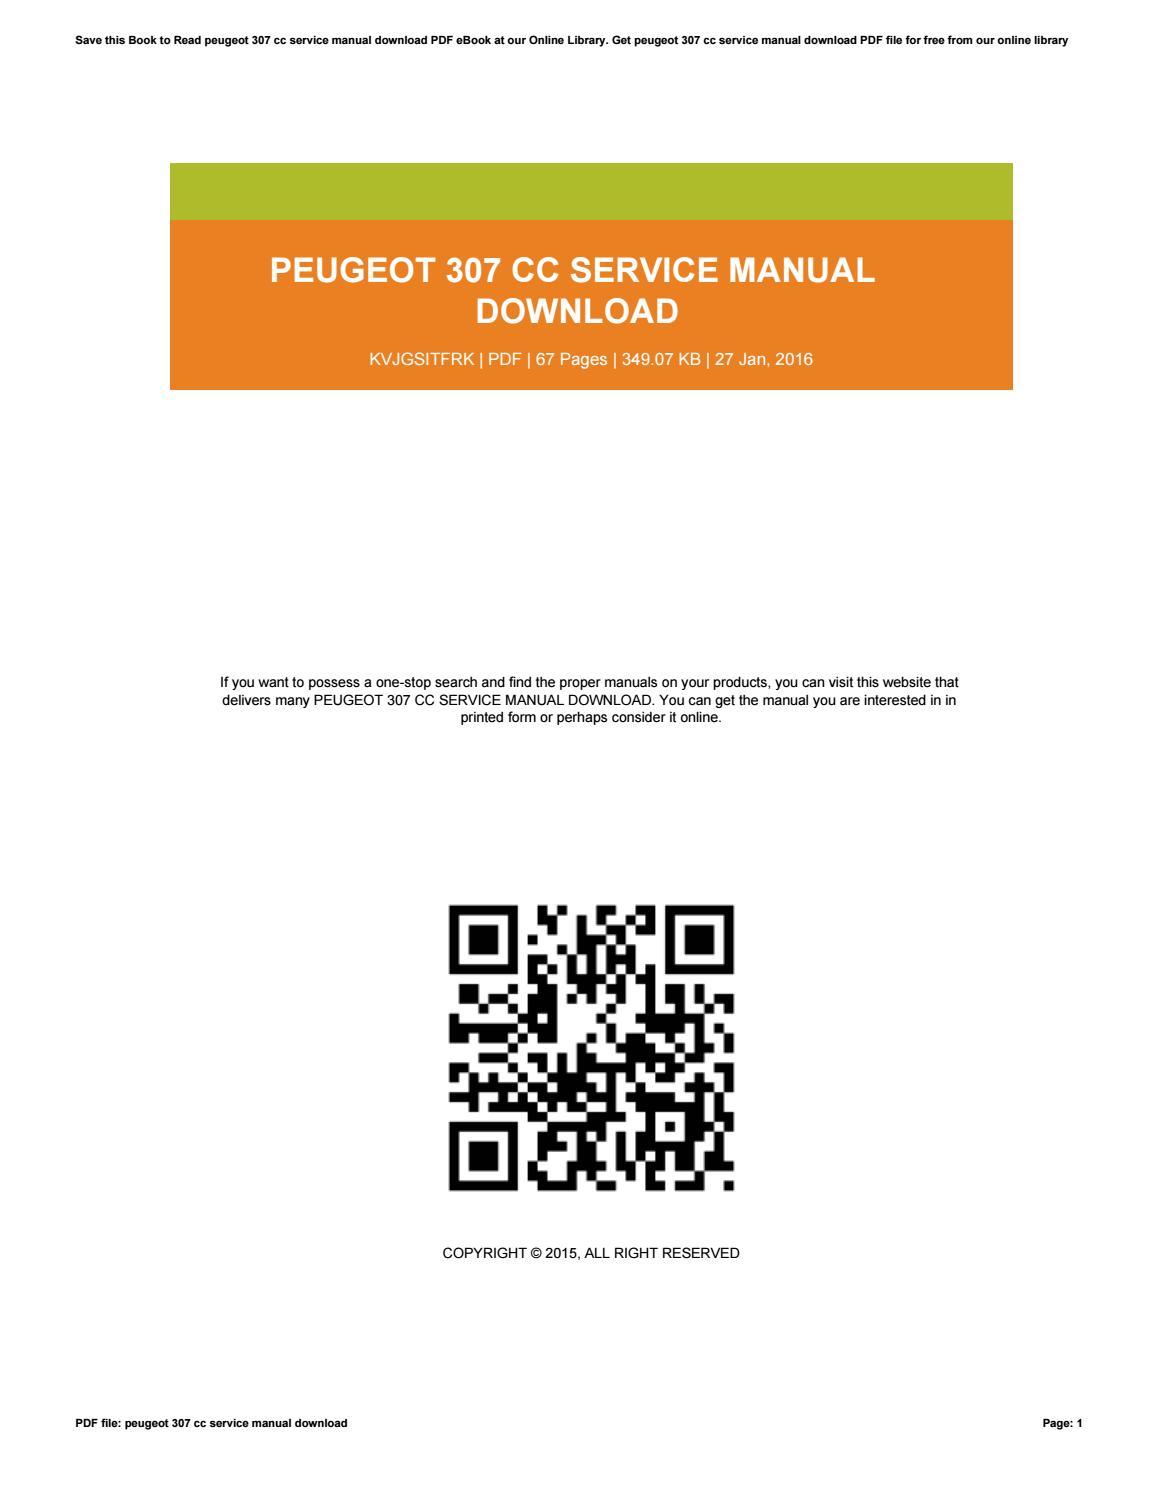 peugeot 307 cc service manual download by brendamann2129 issuu rh issuu com Peugeot 307 Interior Peugeot 208